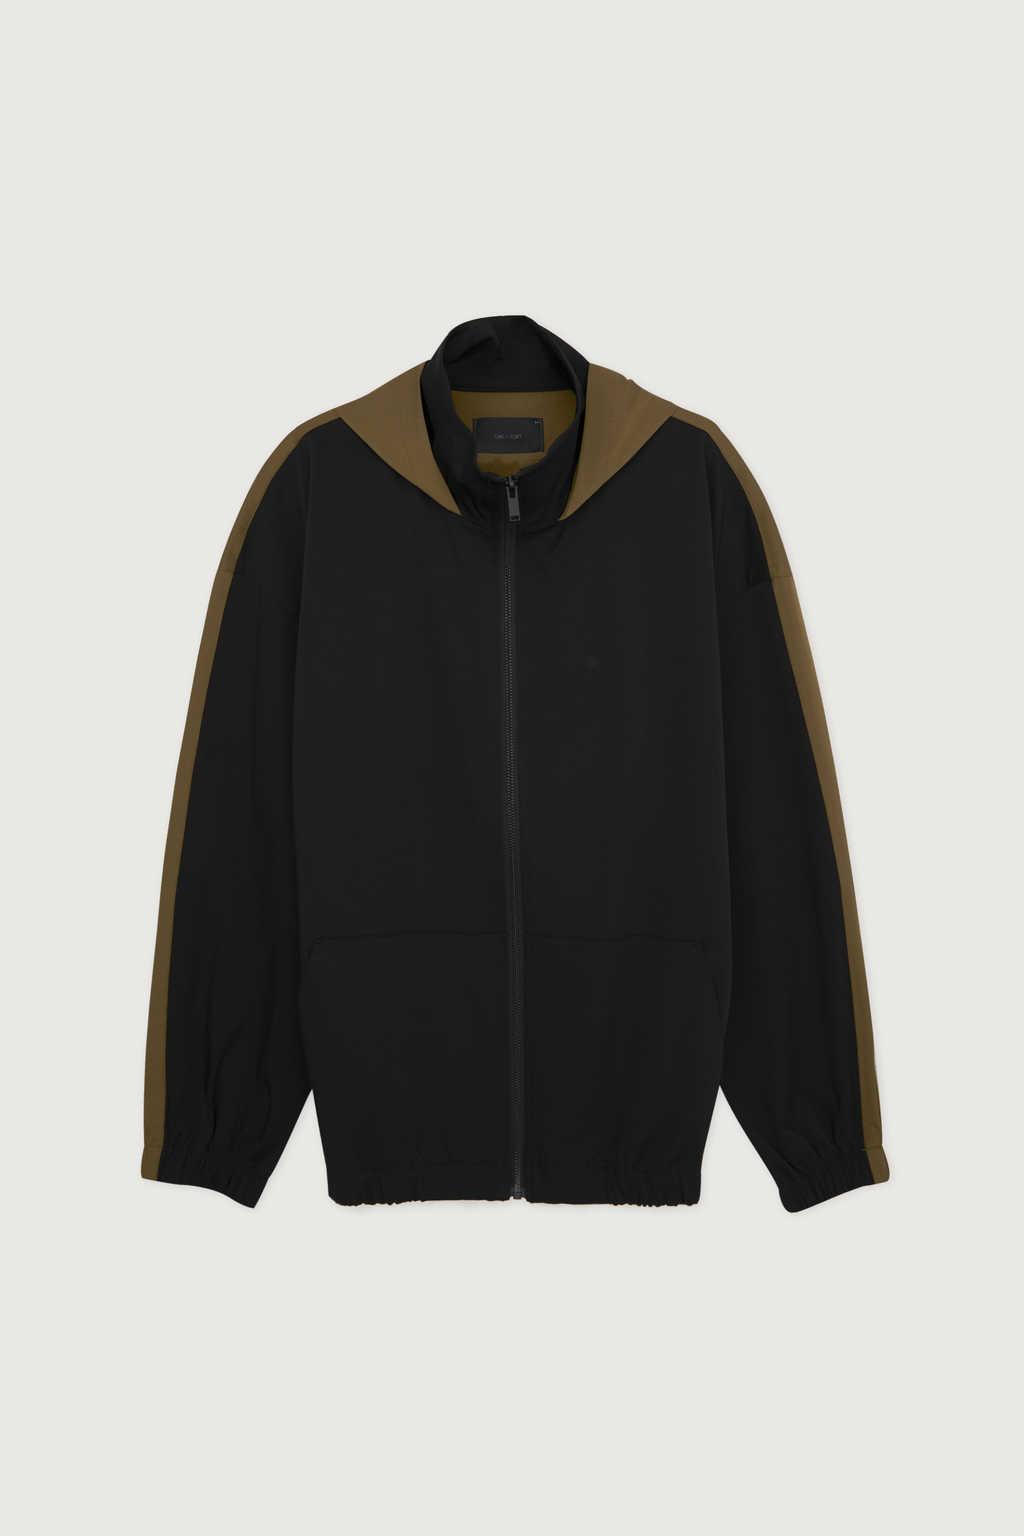 Jacket 3015 Black 11